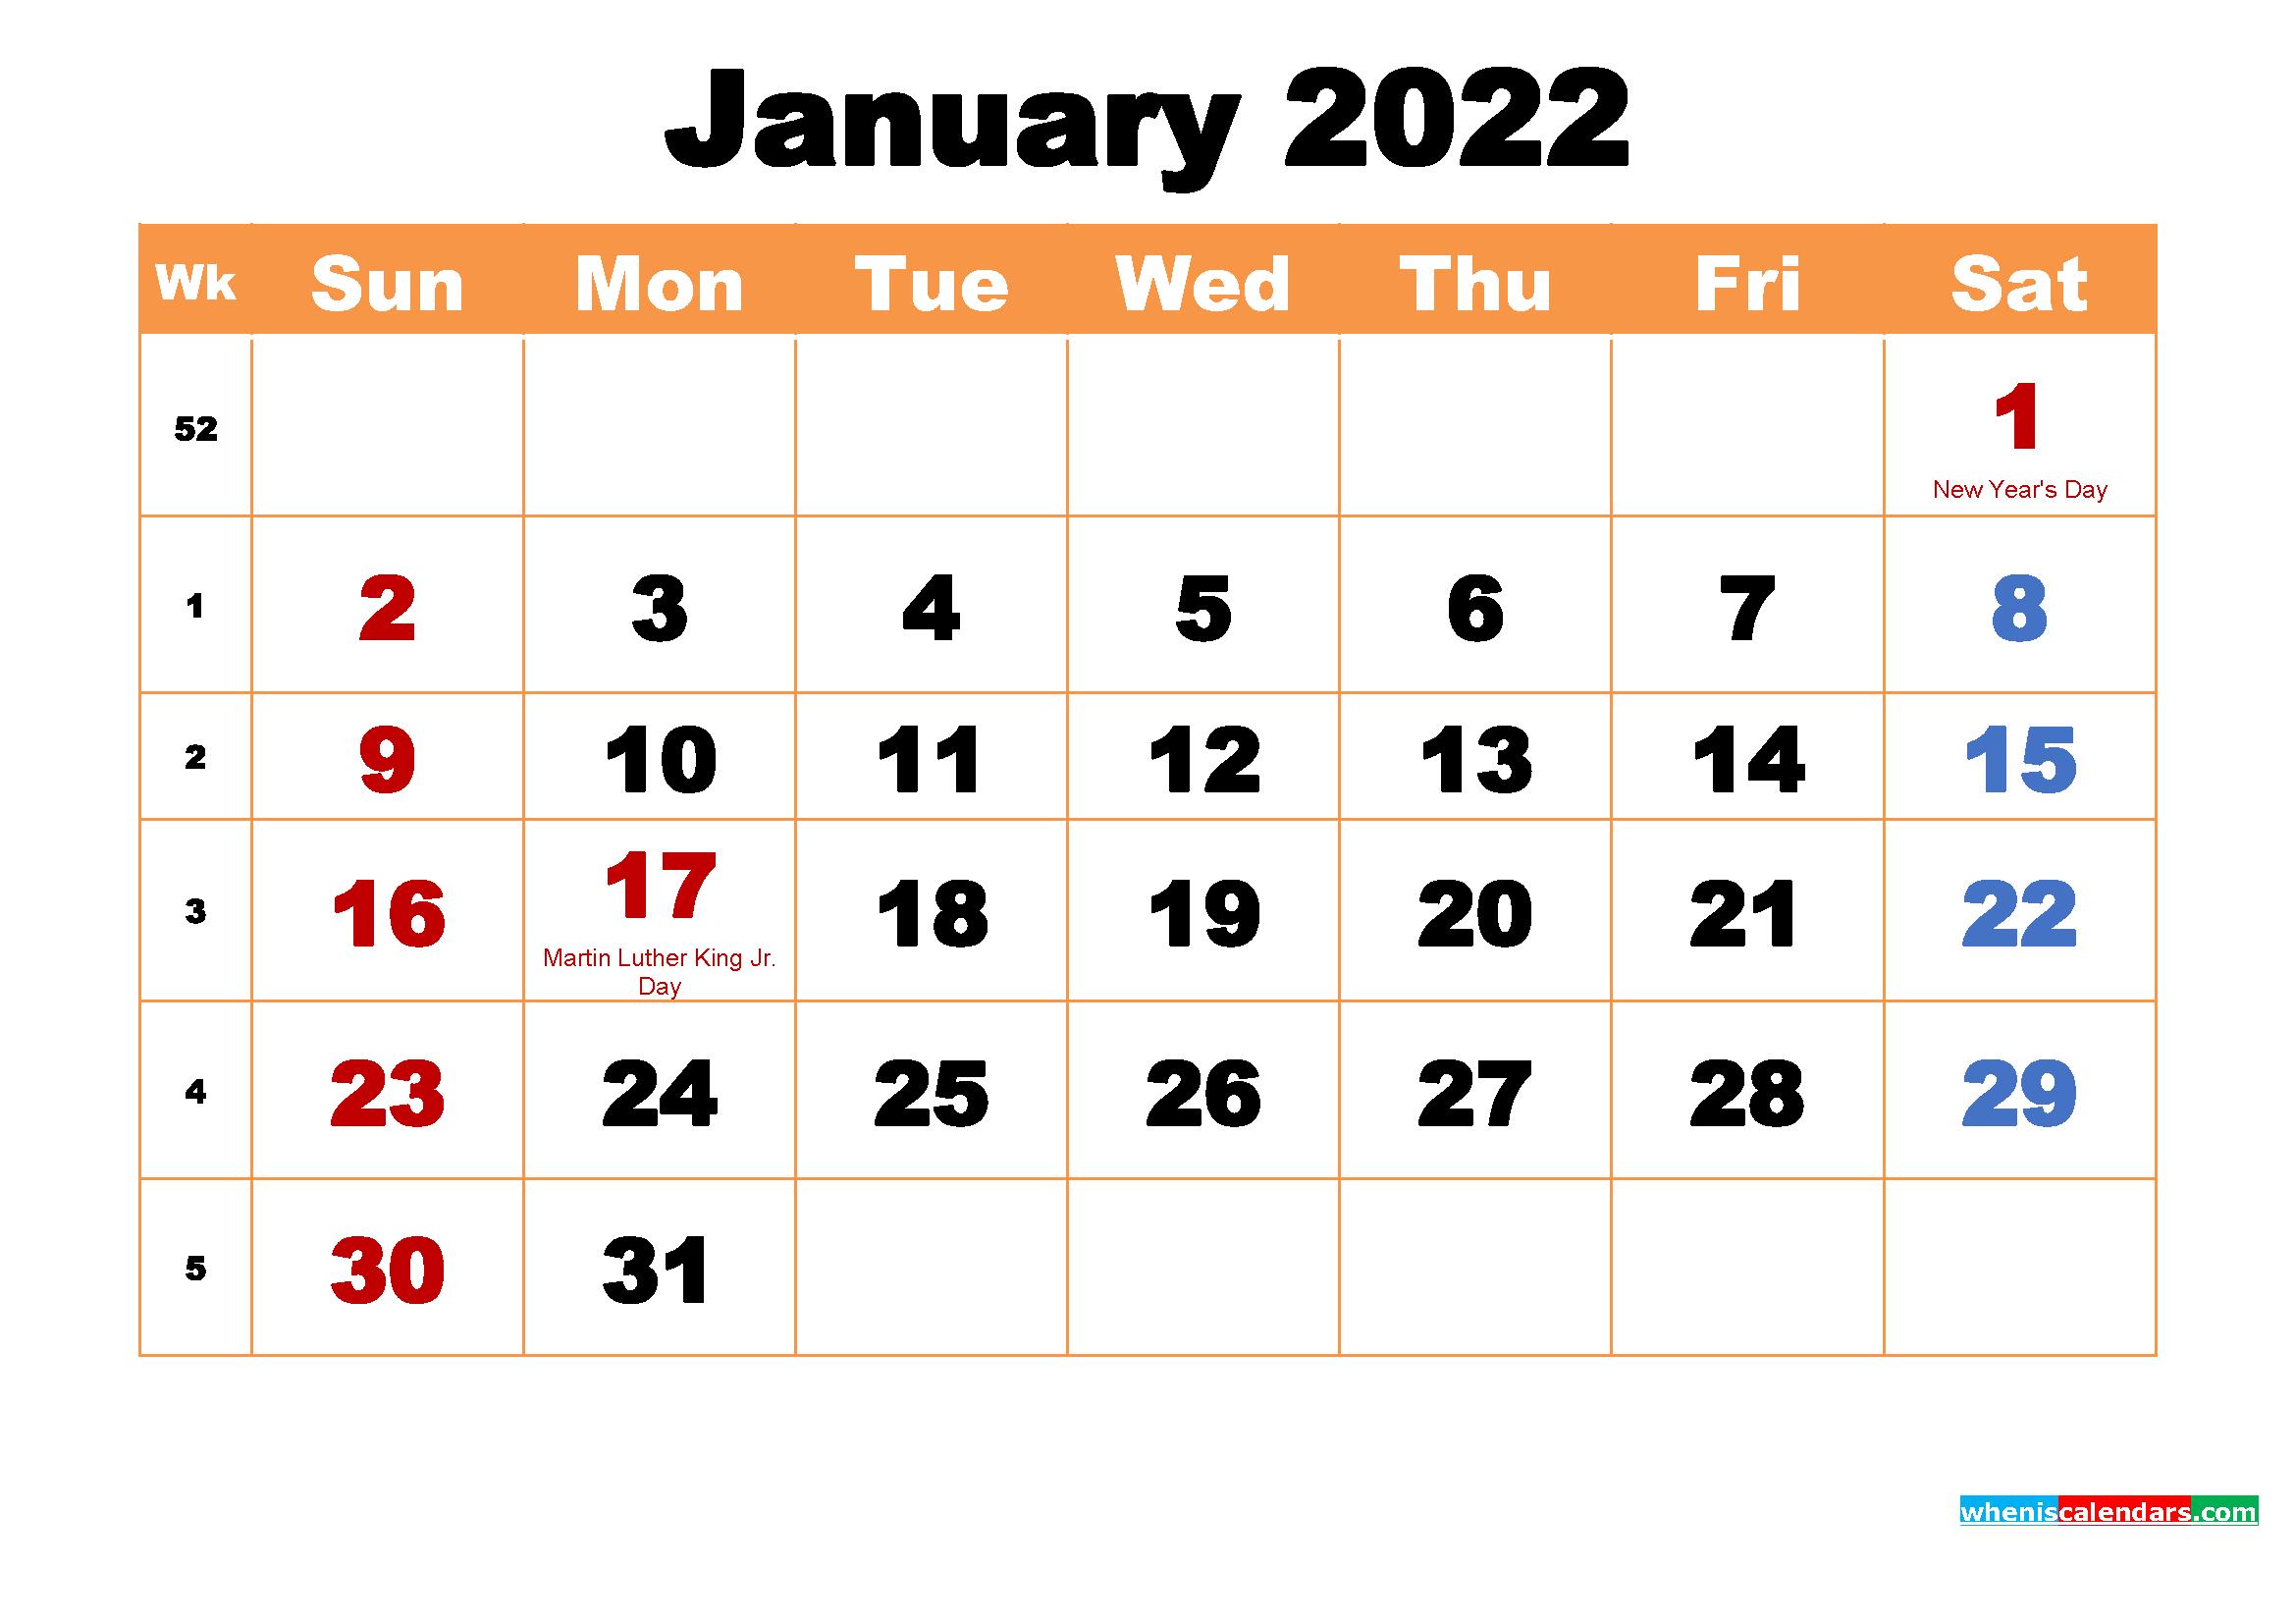 January 2022 Printable Monthly Calendar With Holidays Inside Empty January 2022 Calendar